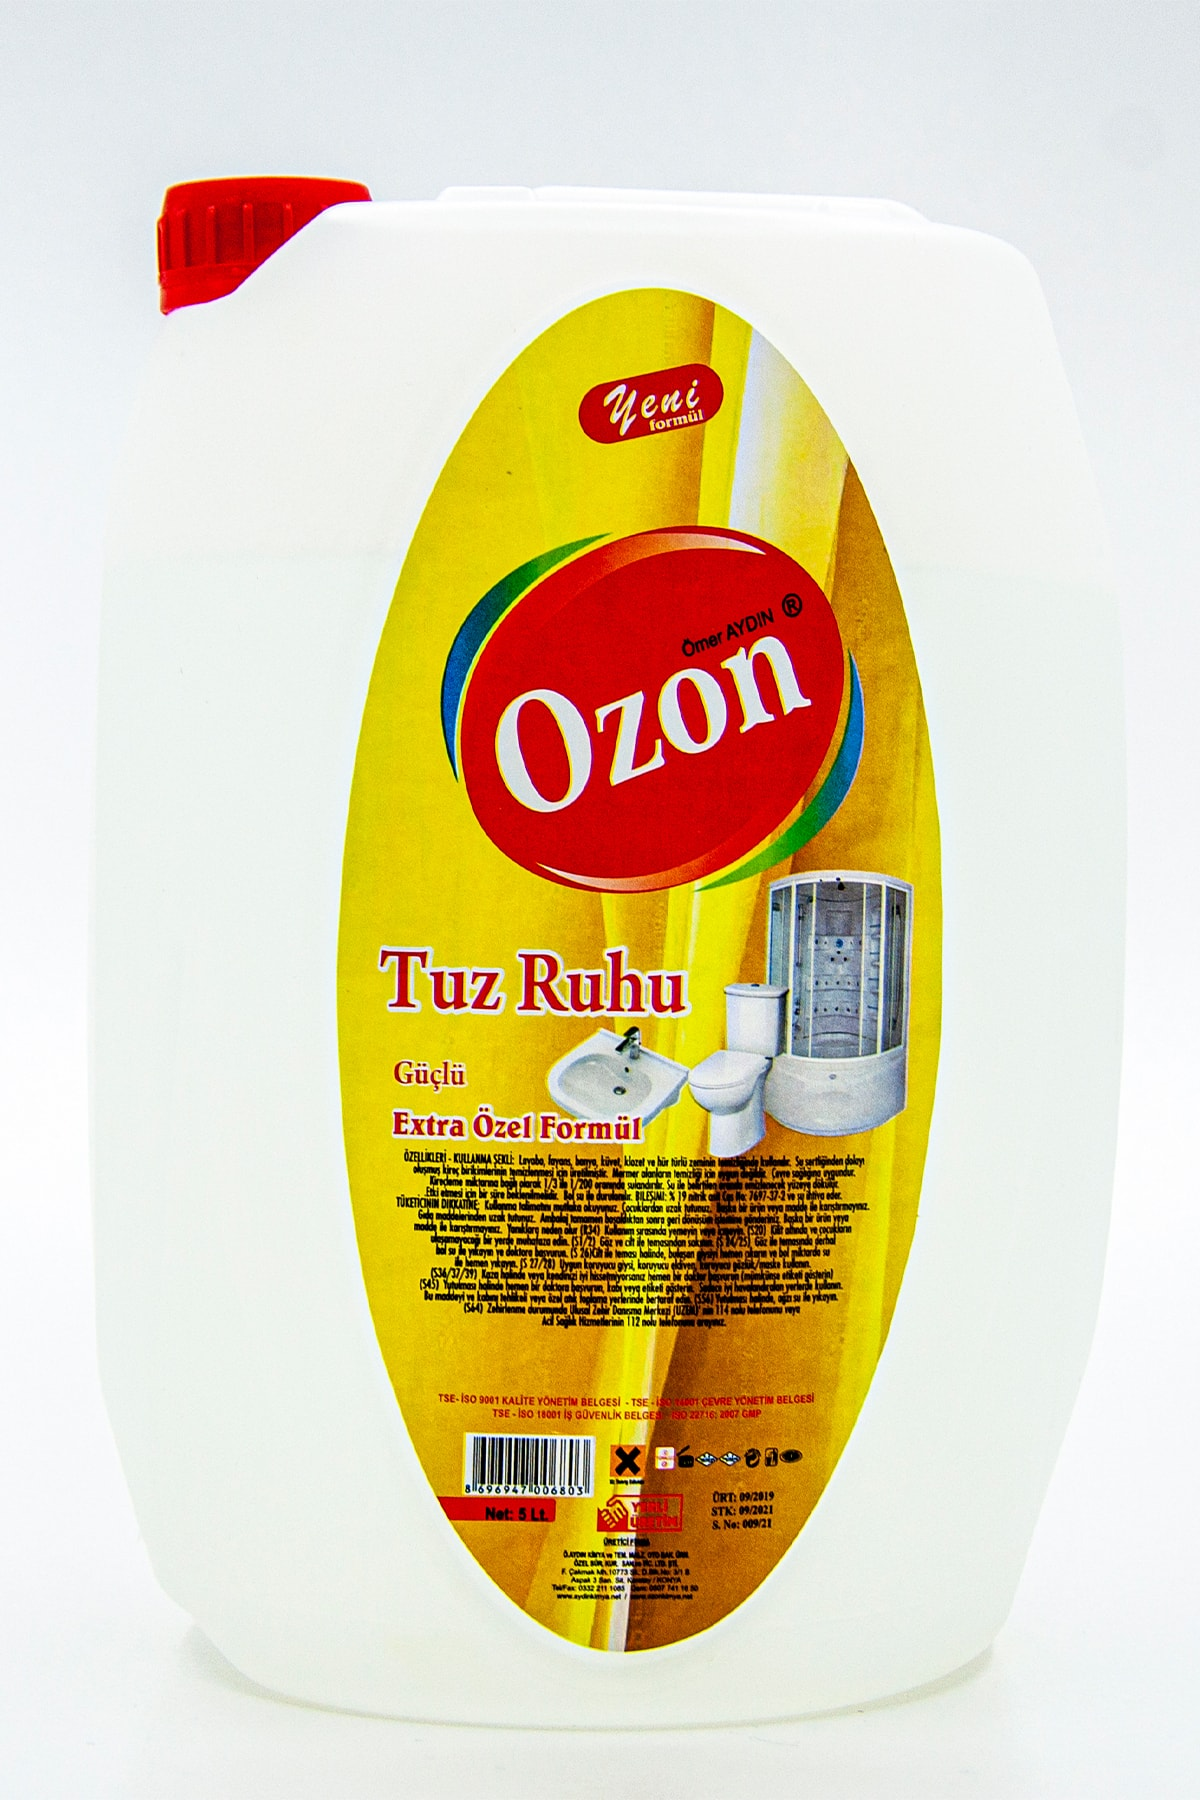 Ozon Tuz Ruhu 5l, Ekstra Özel Formül, Çevreci, Doğa Dostu 1